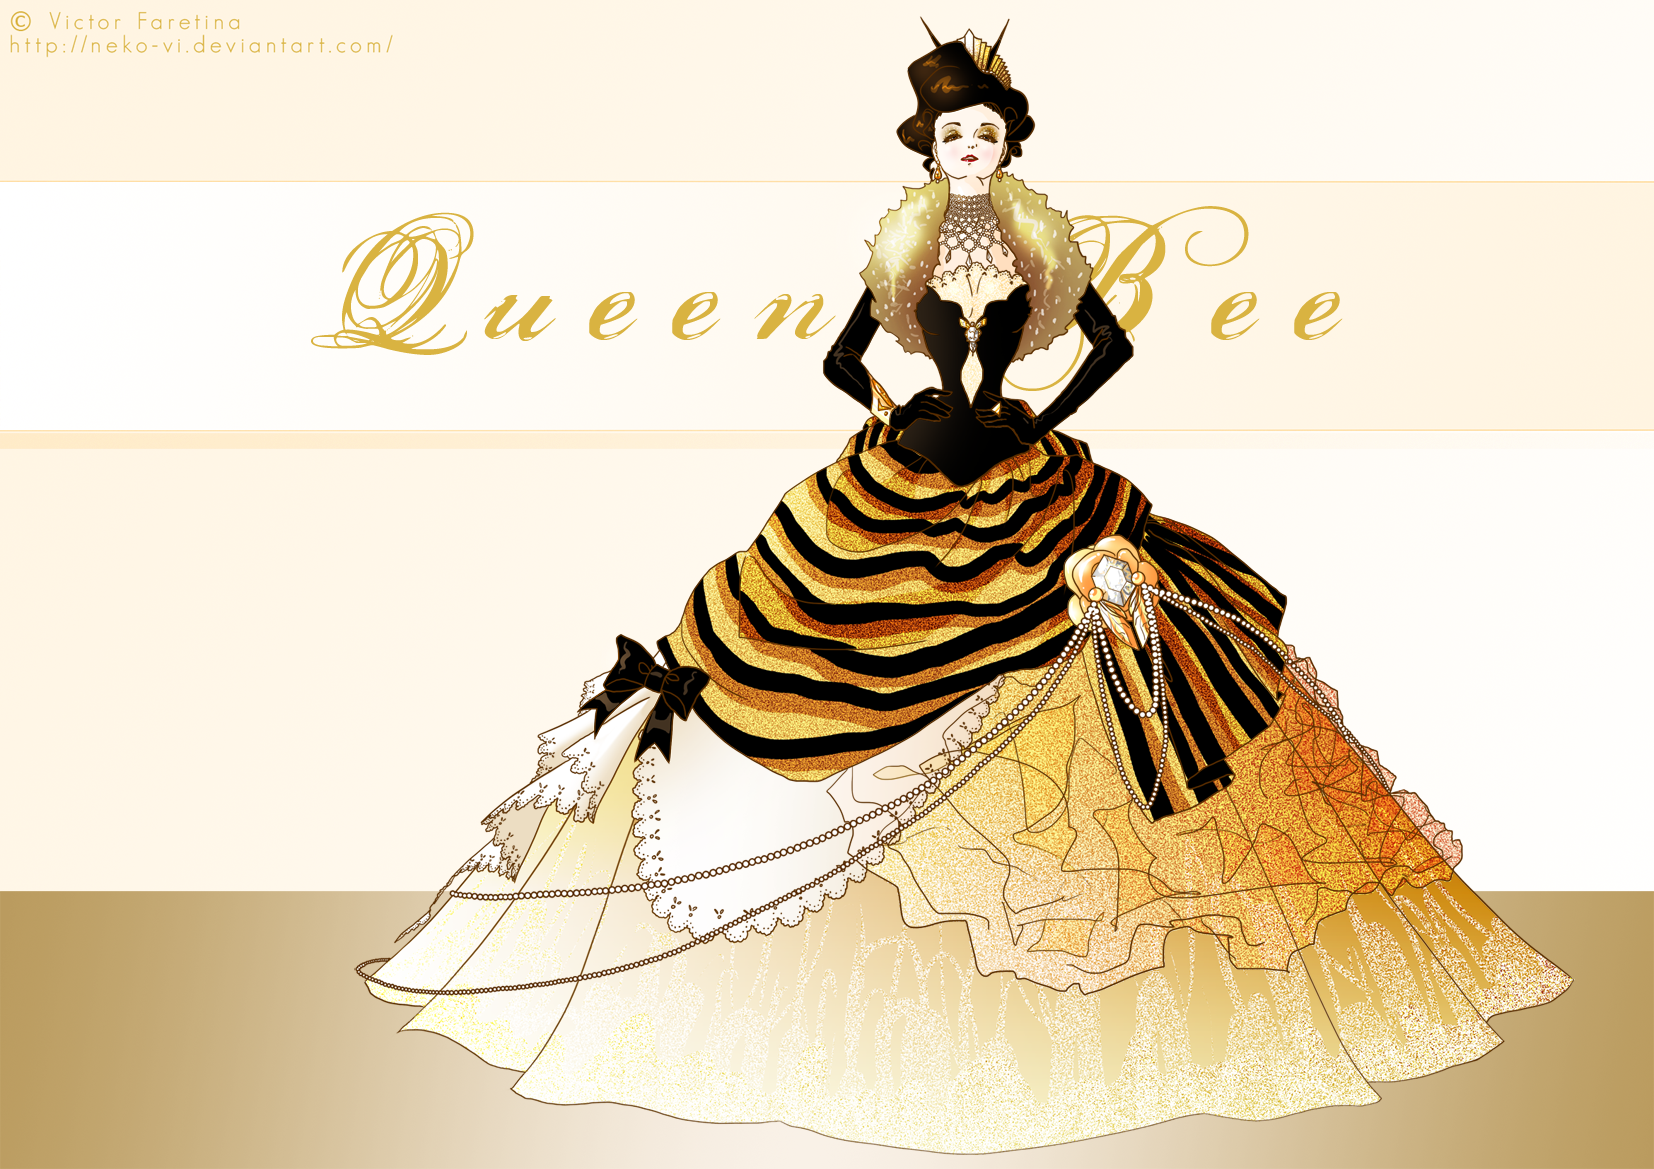 White Net Fashion Dress By Bees